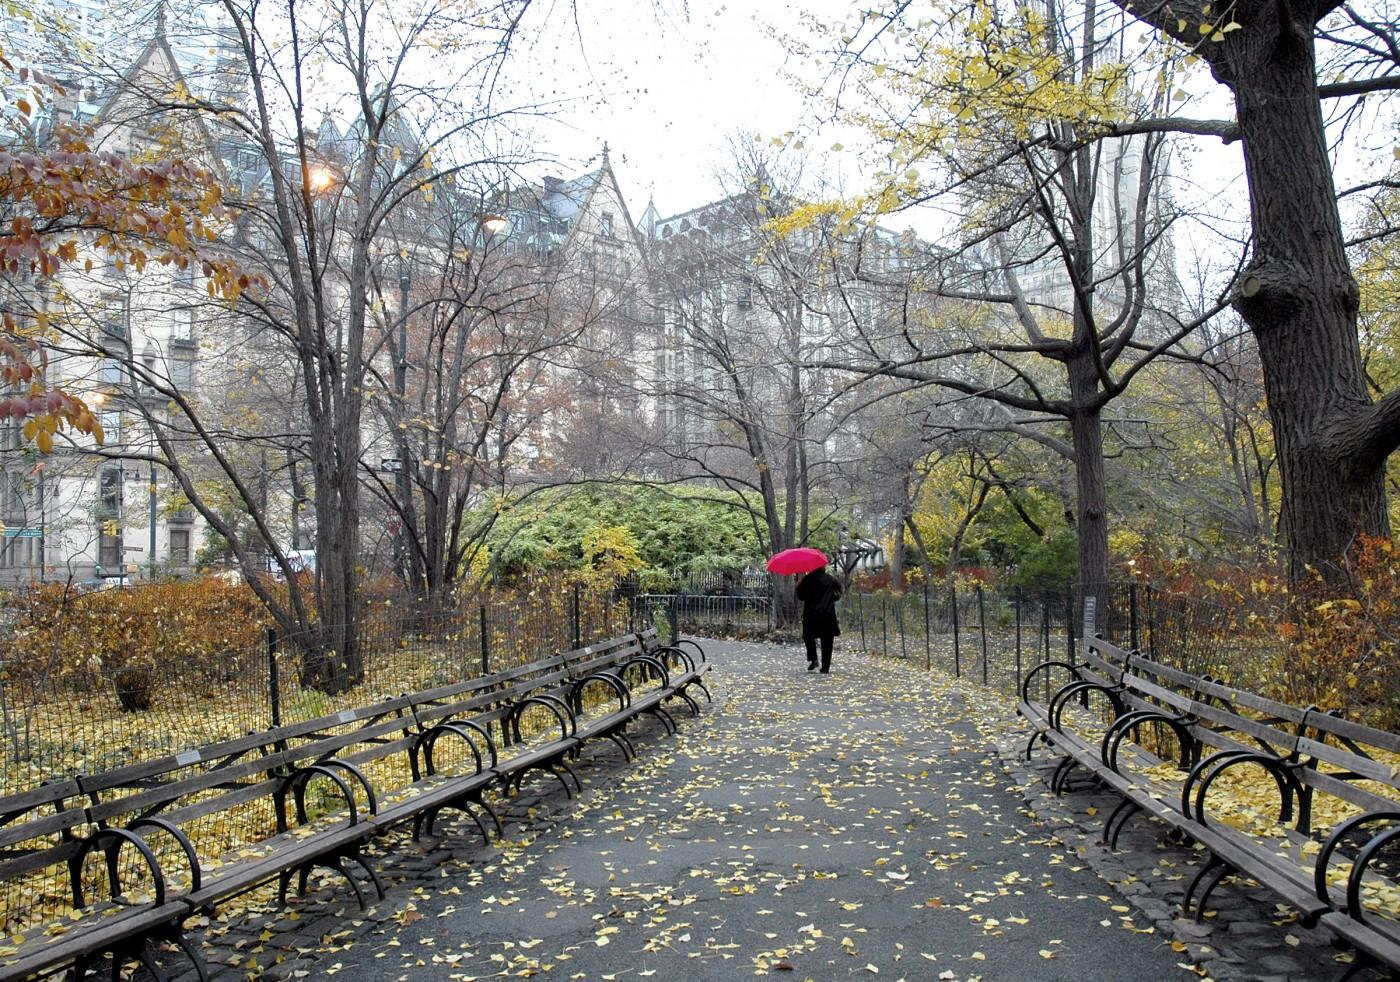 Chico, </span><span><em>A Walk in the Park</em>